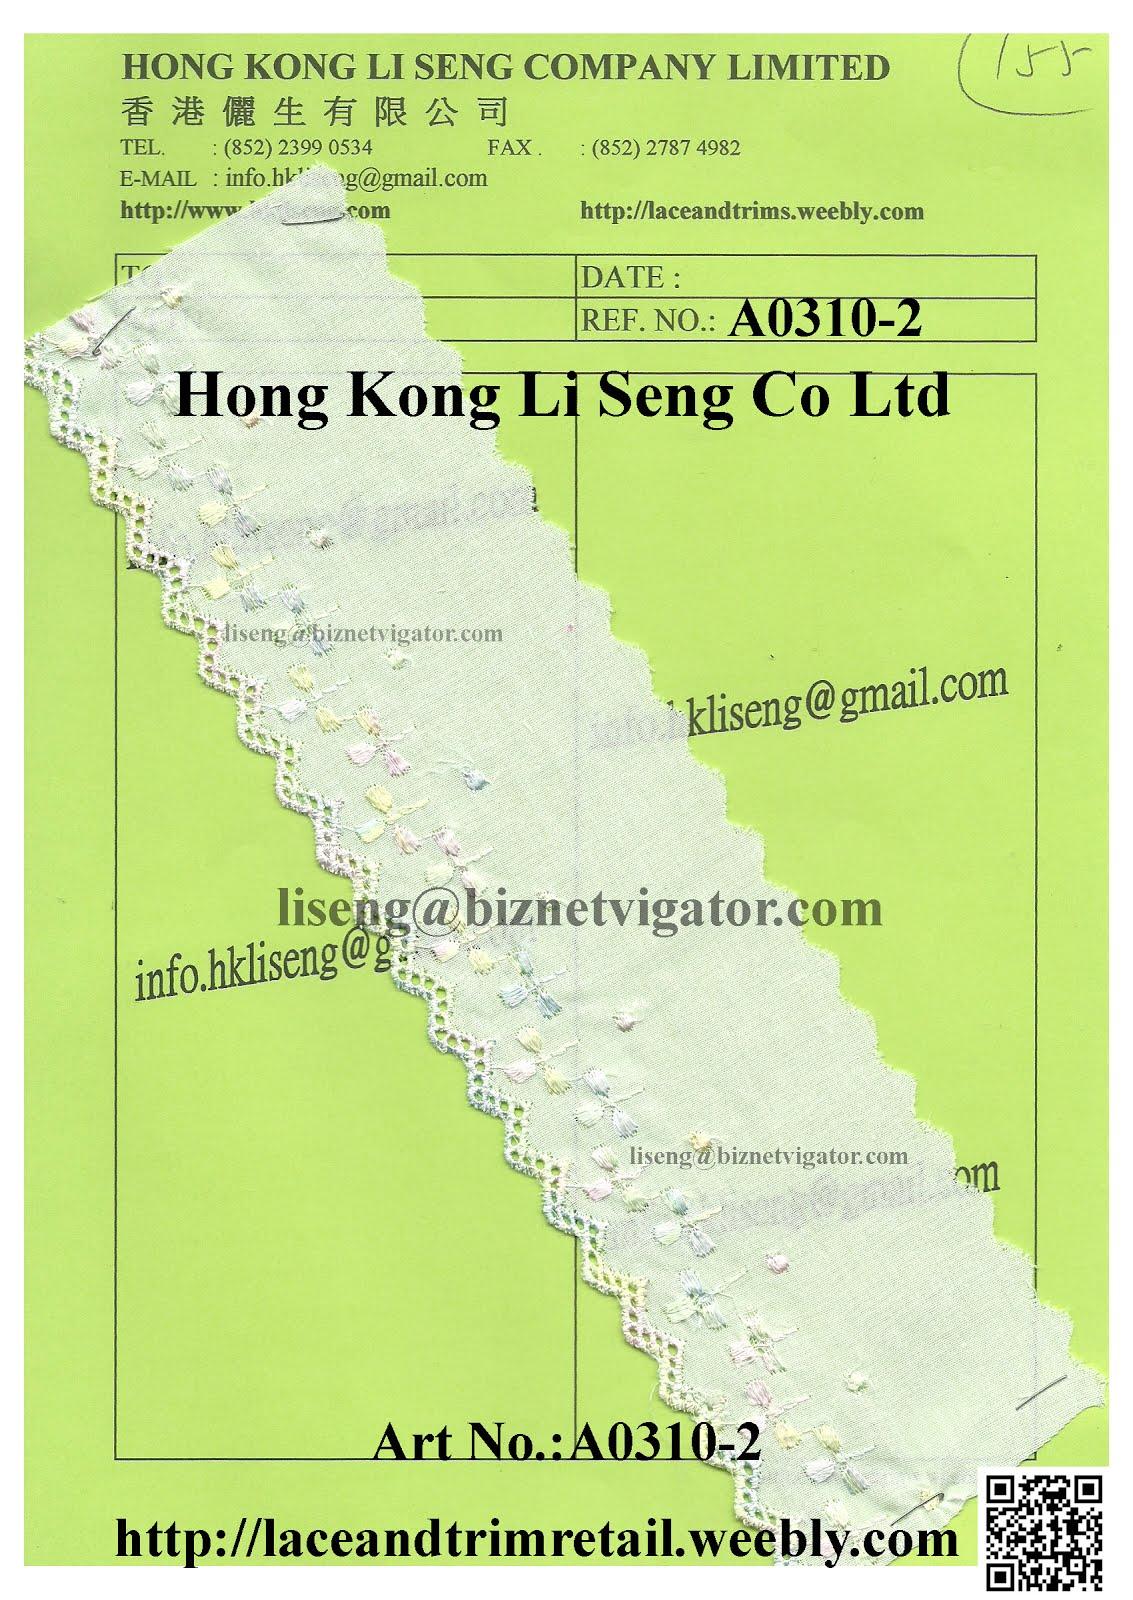 Global Stocklot Lace Trims Wholesaler Manufacturer and Supplier - Hong Kong Li Seng Co Ltd